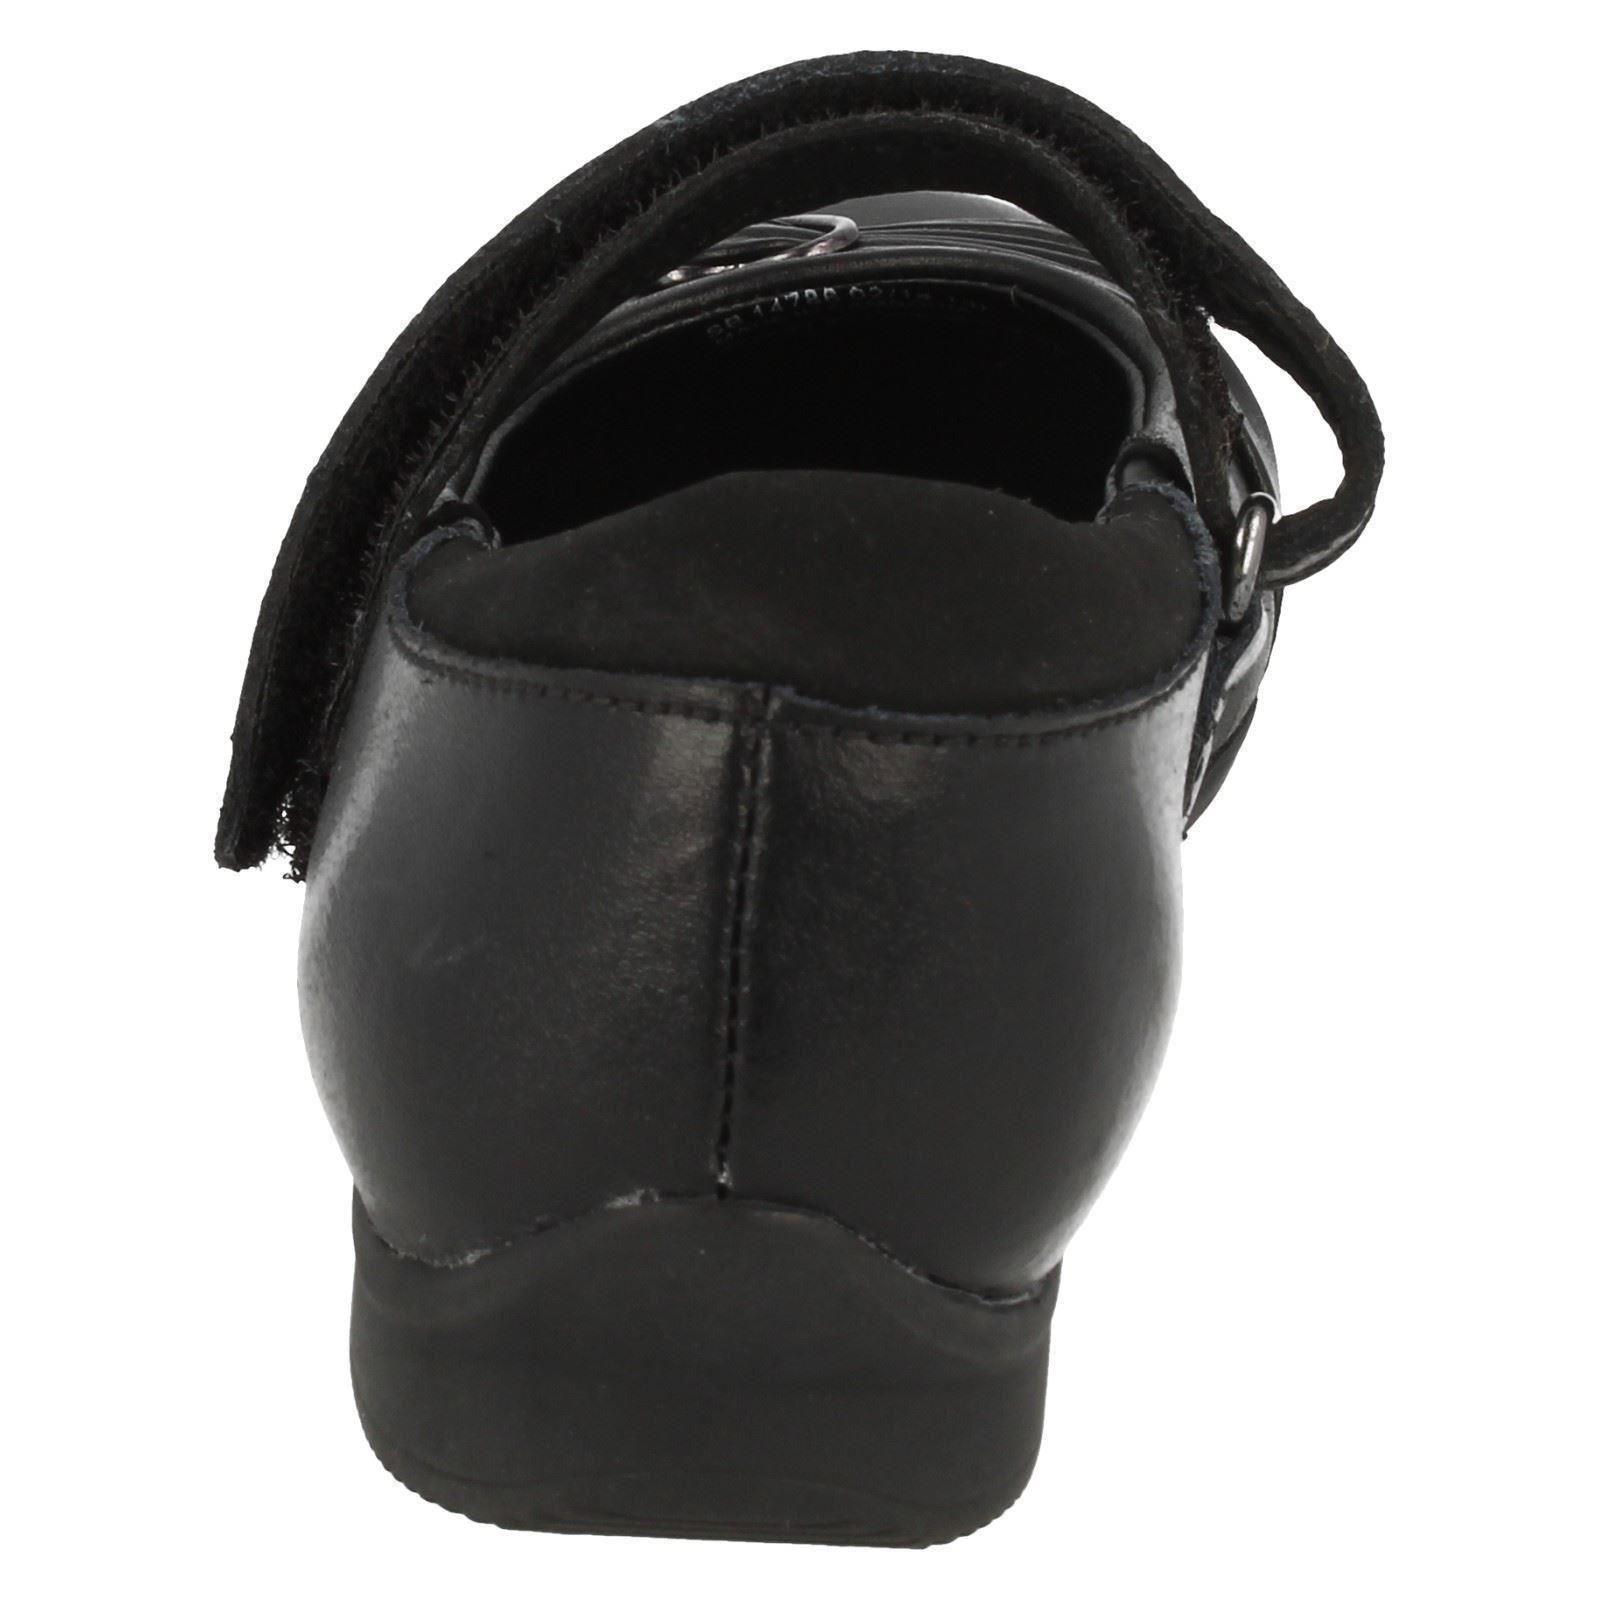 Clarks Girls Formal/School Shoes - Dolly Heart